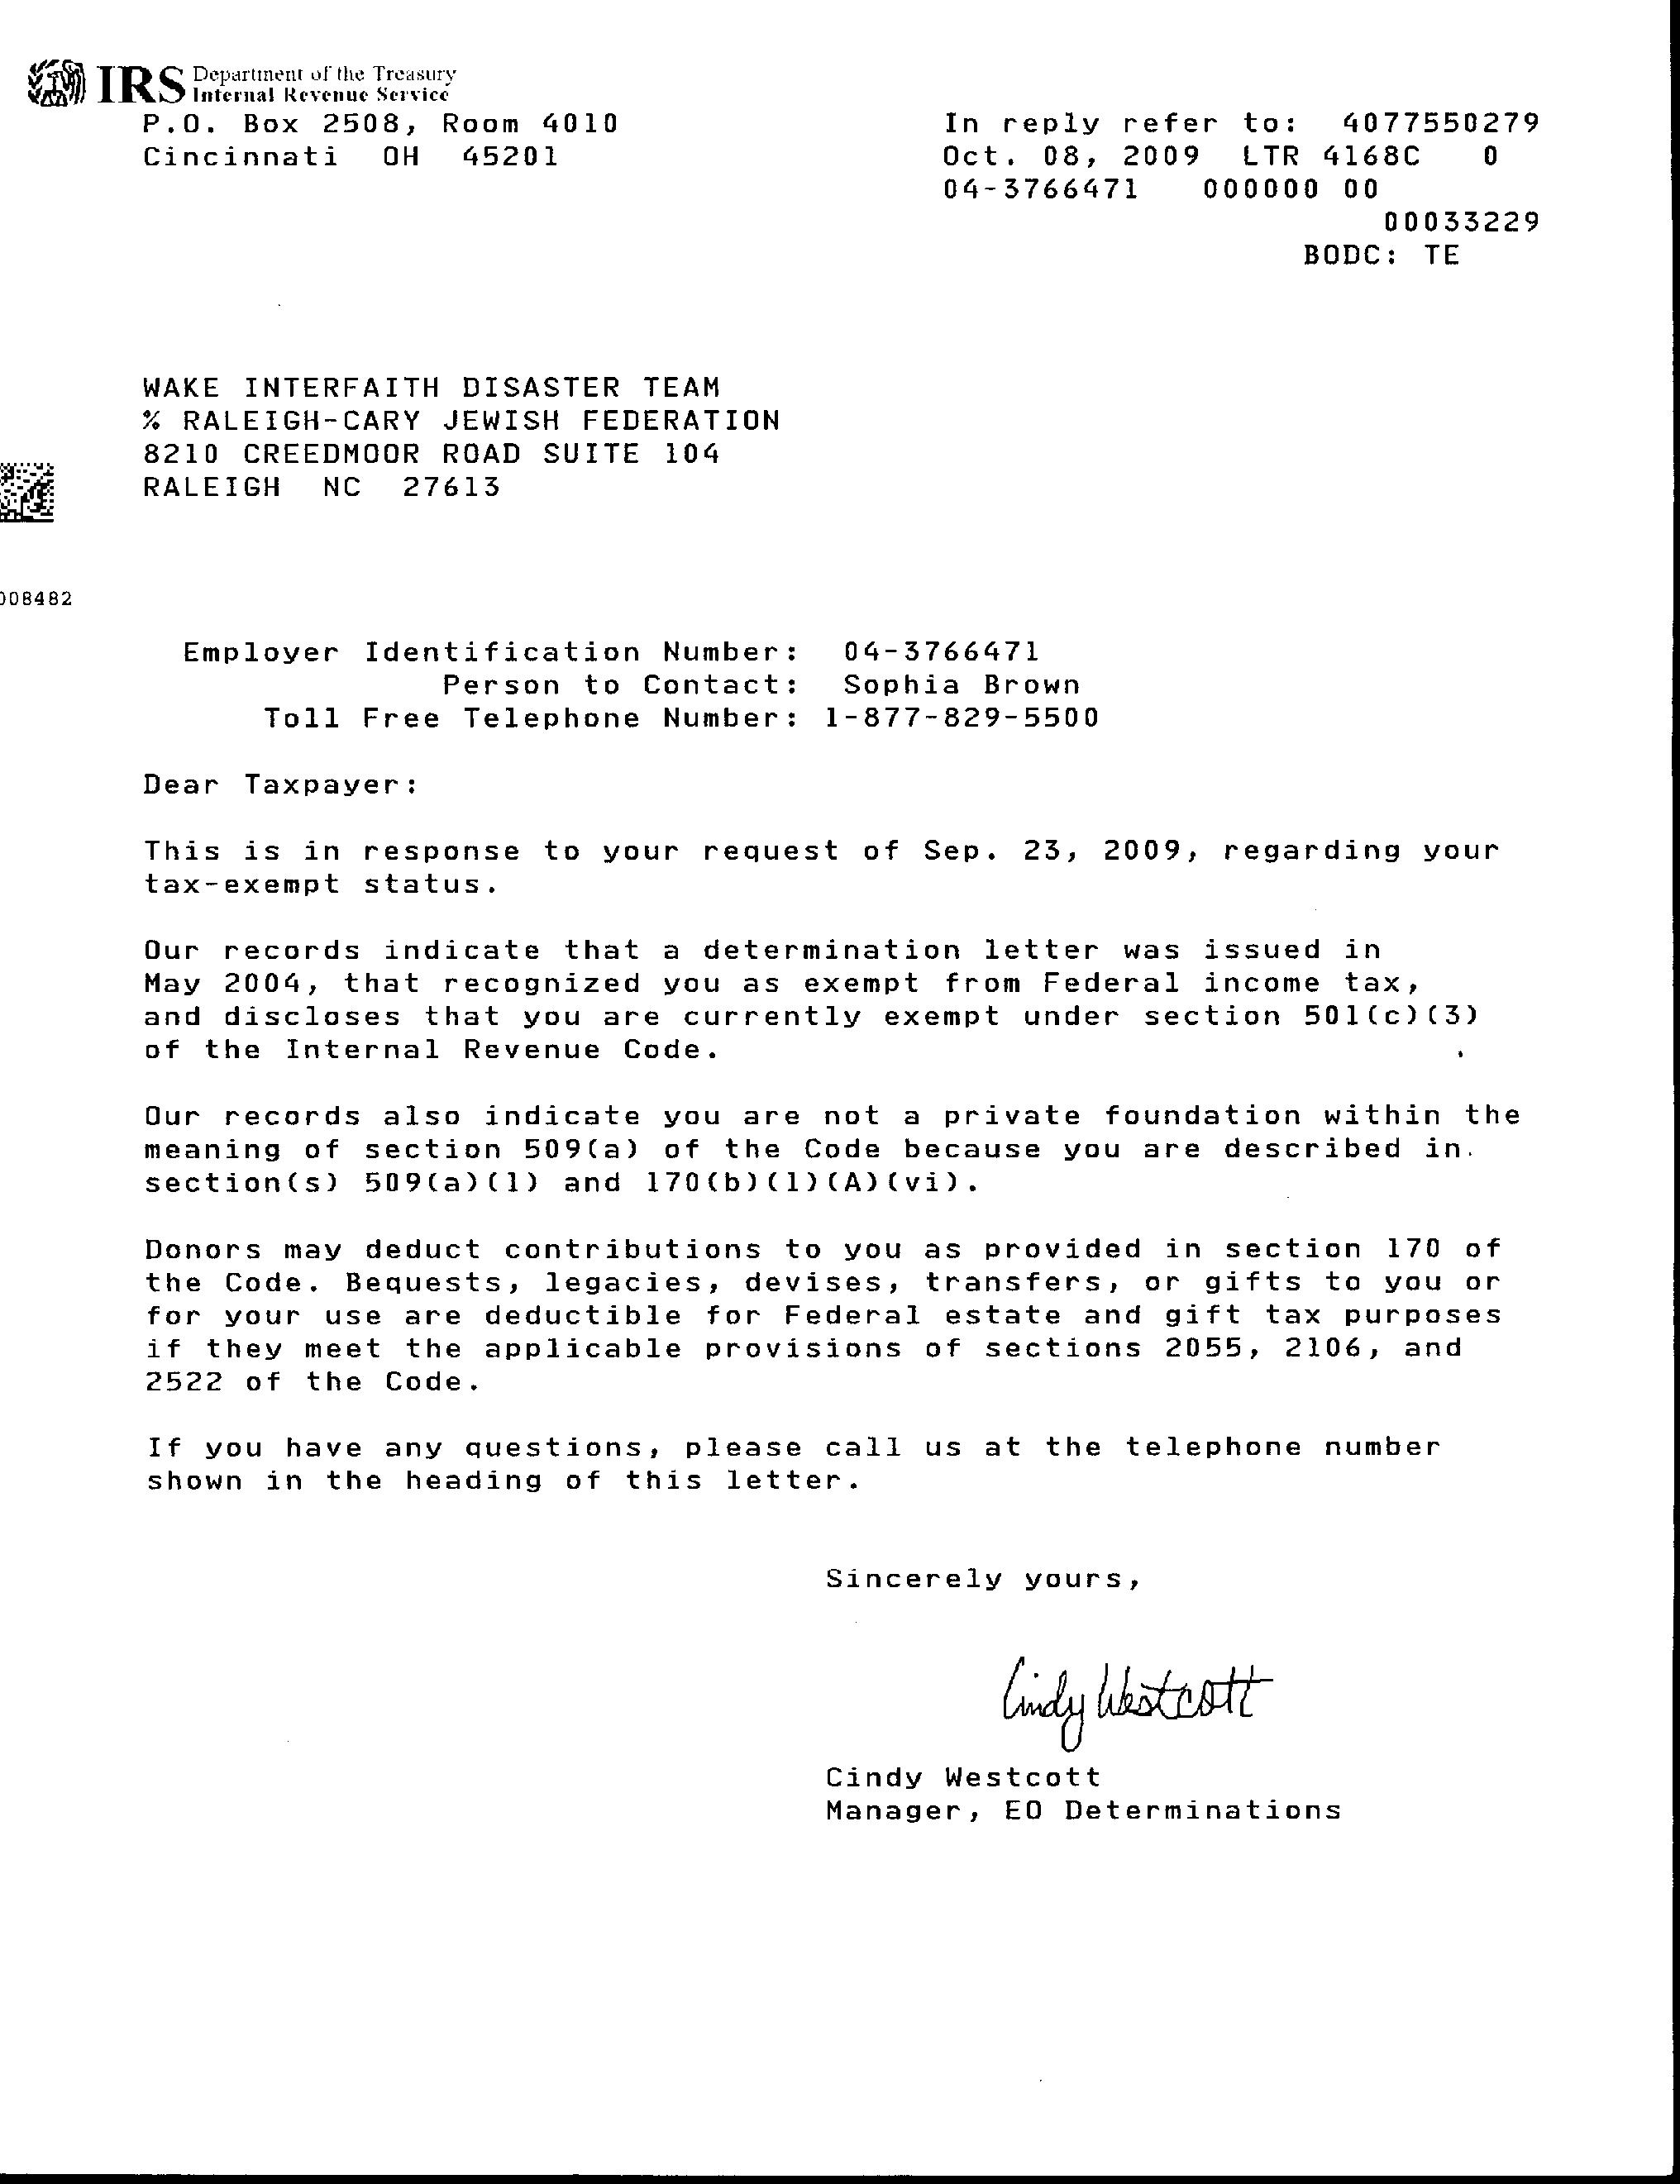 Wake Interfaith Disaster Team: Documents